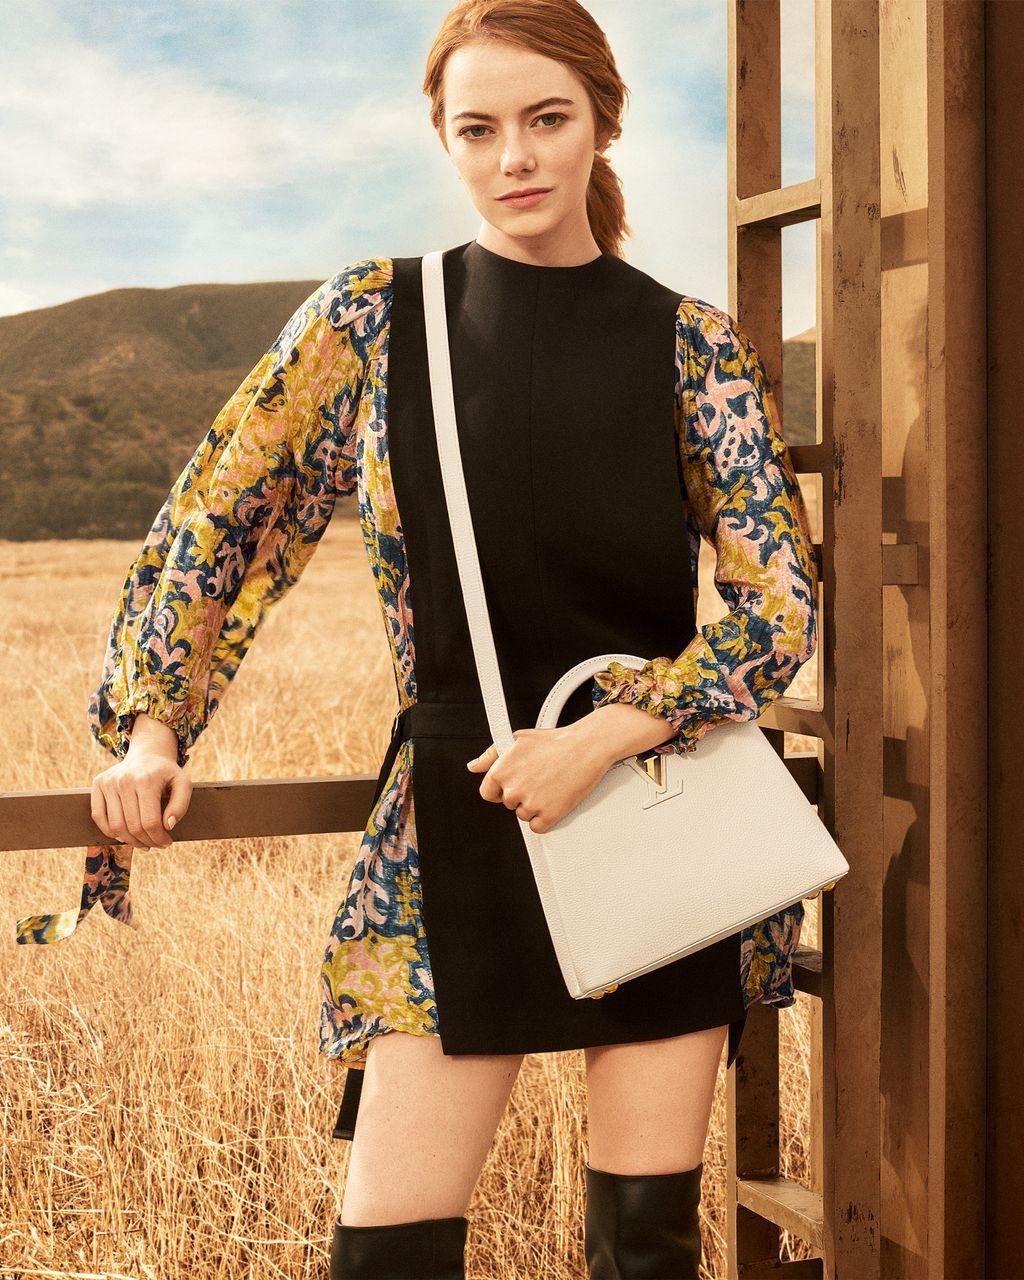 Louis Vuitton Spirit of Travel Fashionela